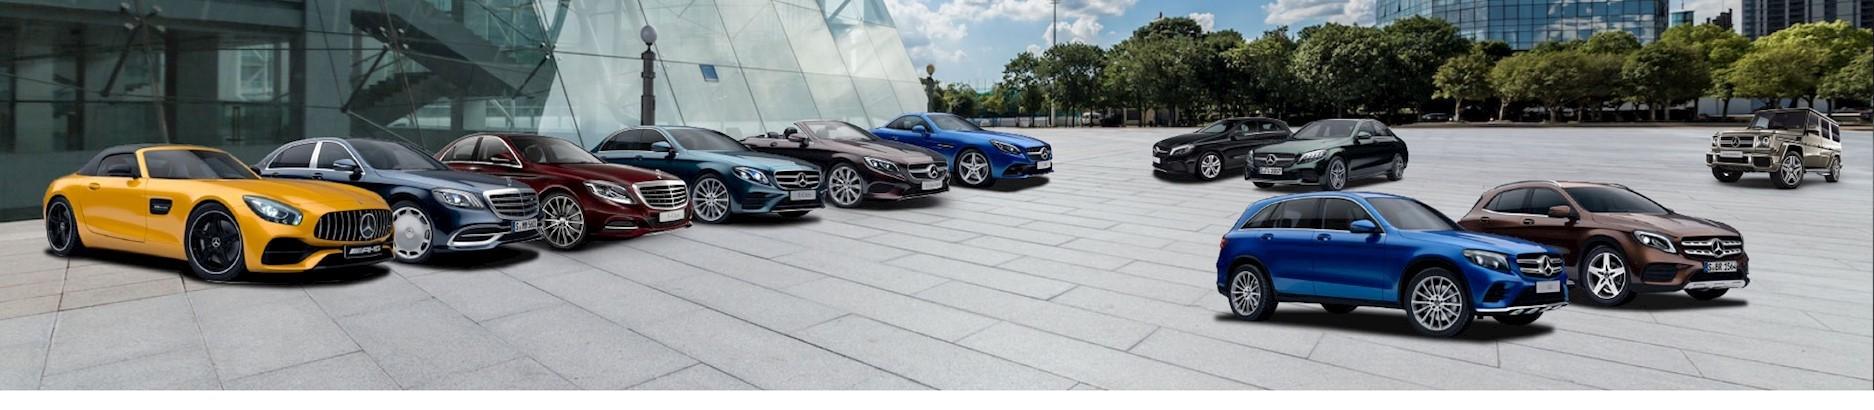 Mercedes-Benz Autosat Satélite